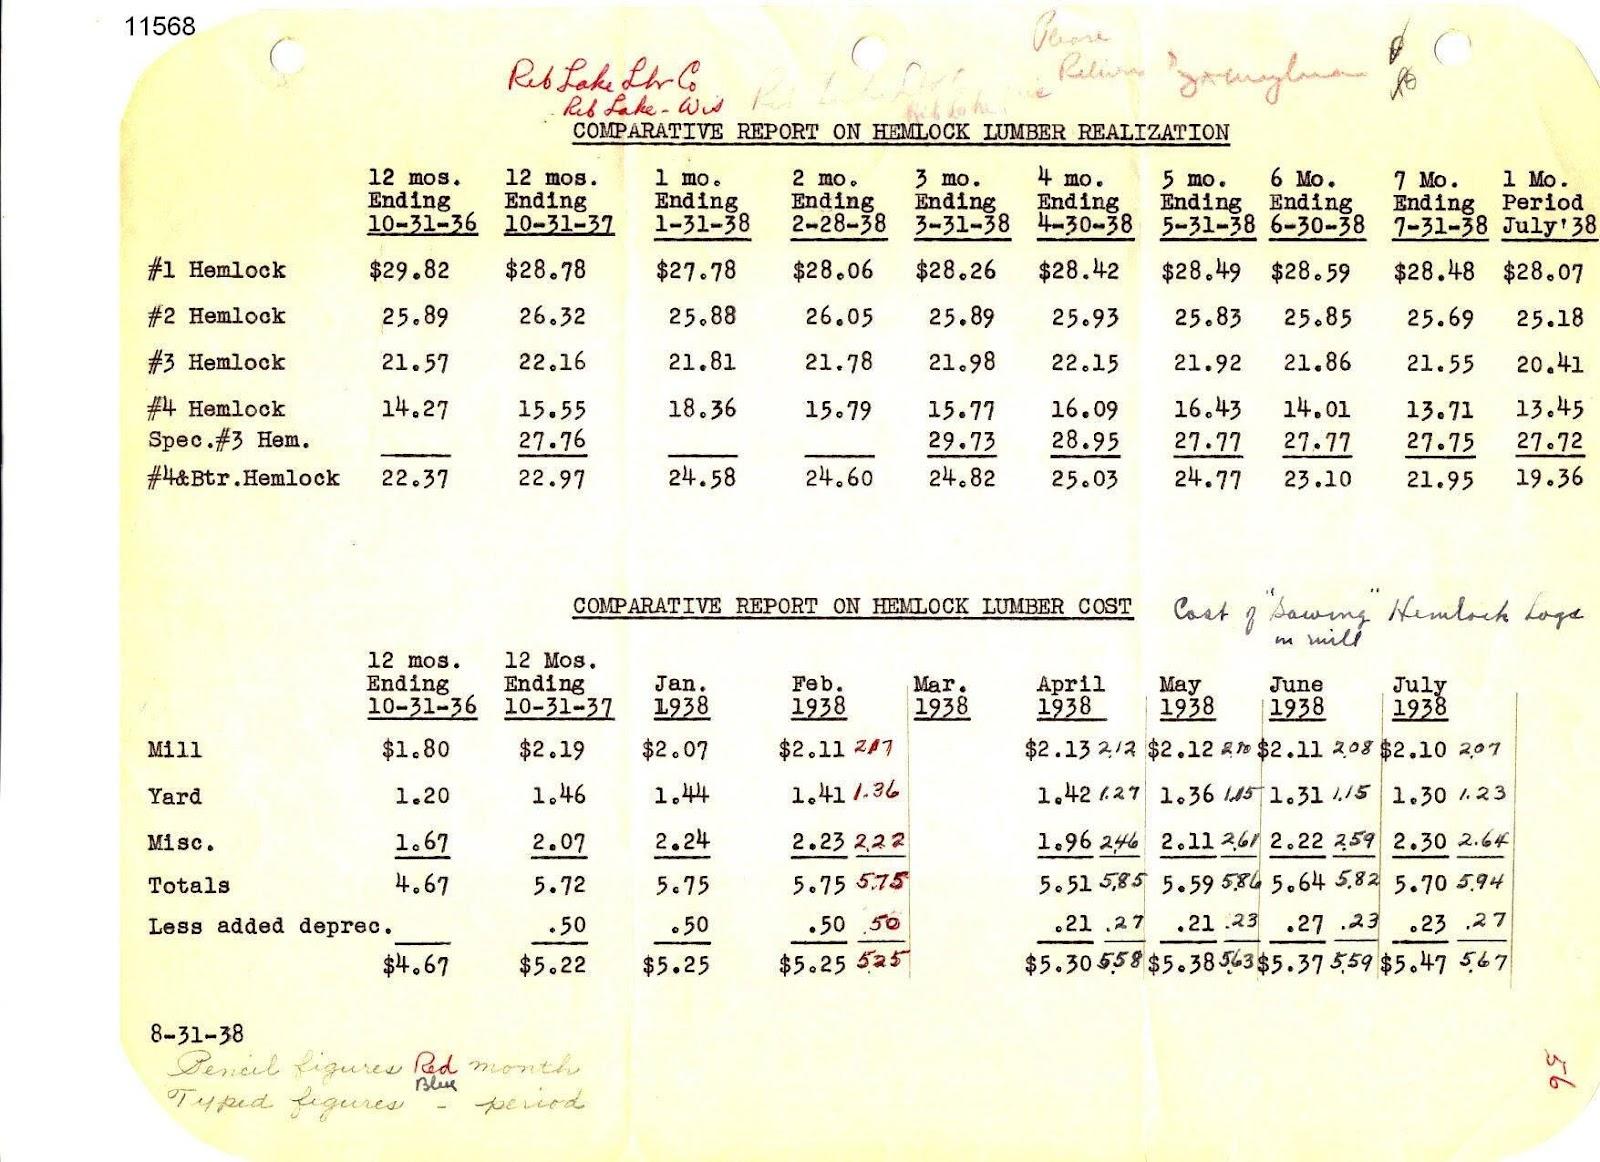 C:\Users\Robert P. Rusch\Desktop\II. RLHSoc\Documents & Photos-Scanned\Rib Lake History 11500-11599\11568-Comparative report on hemlock realization 8-31-1938, RLLC.jpg